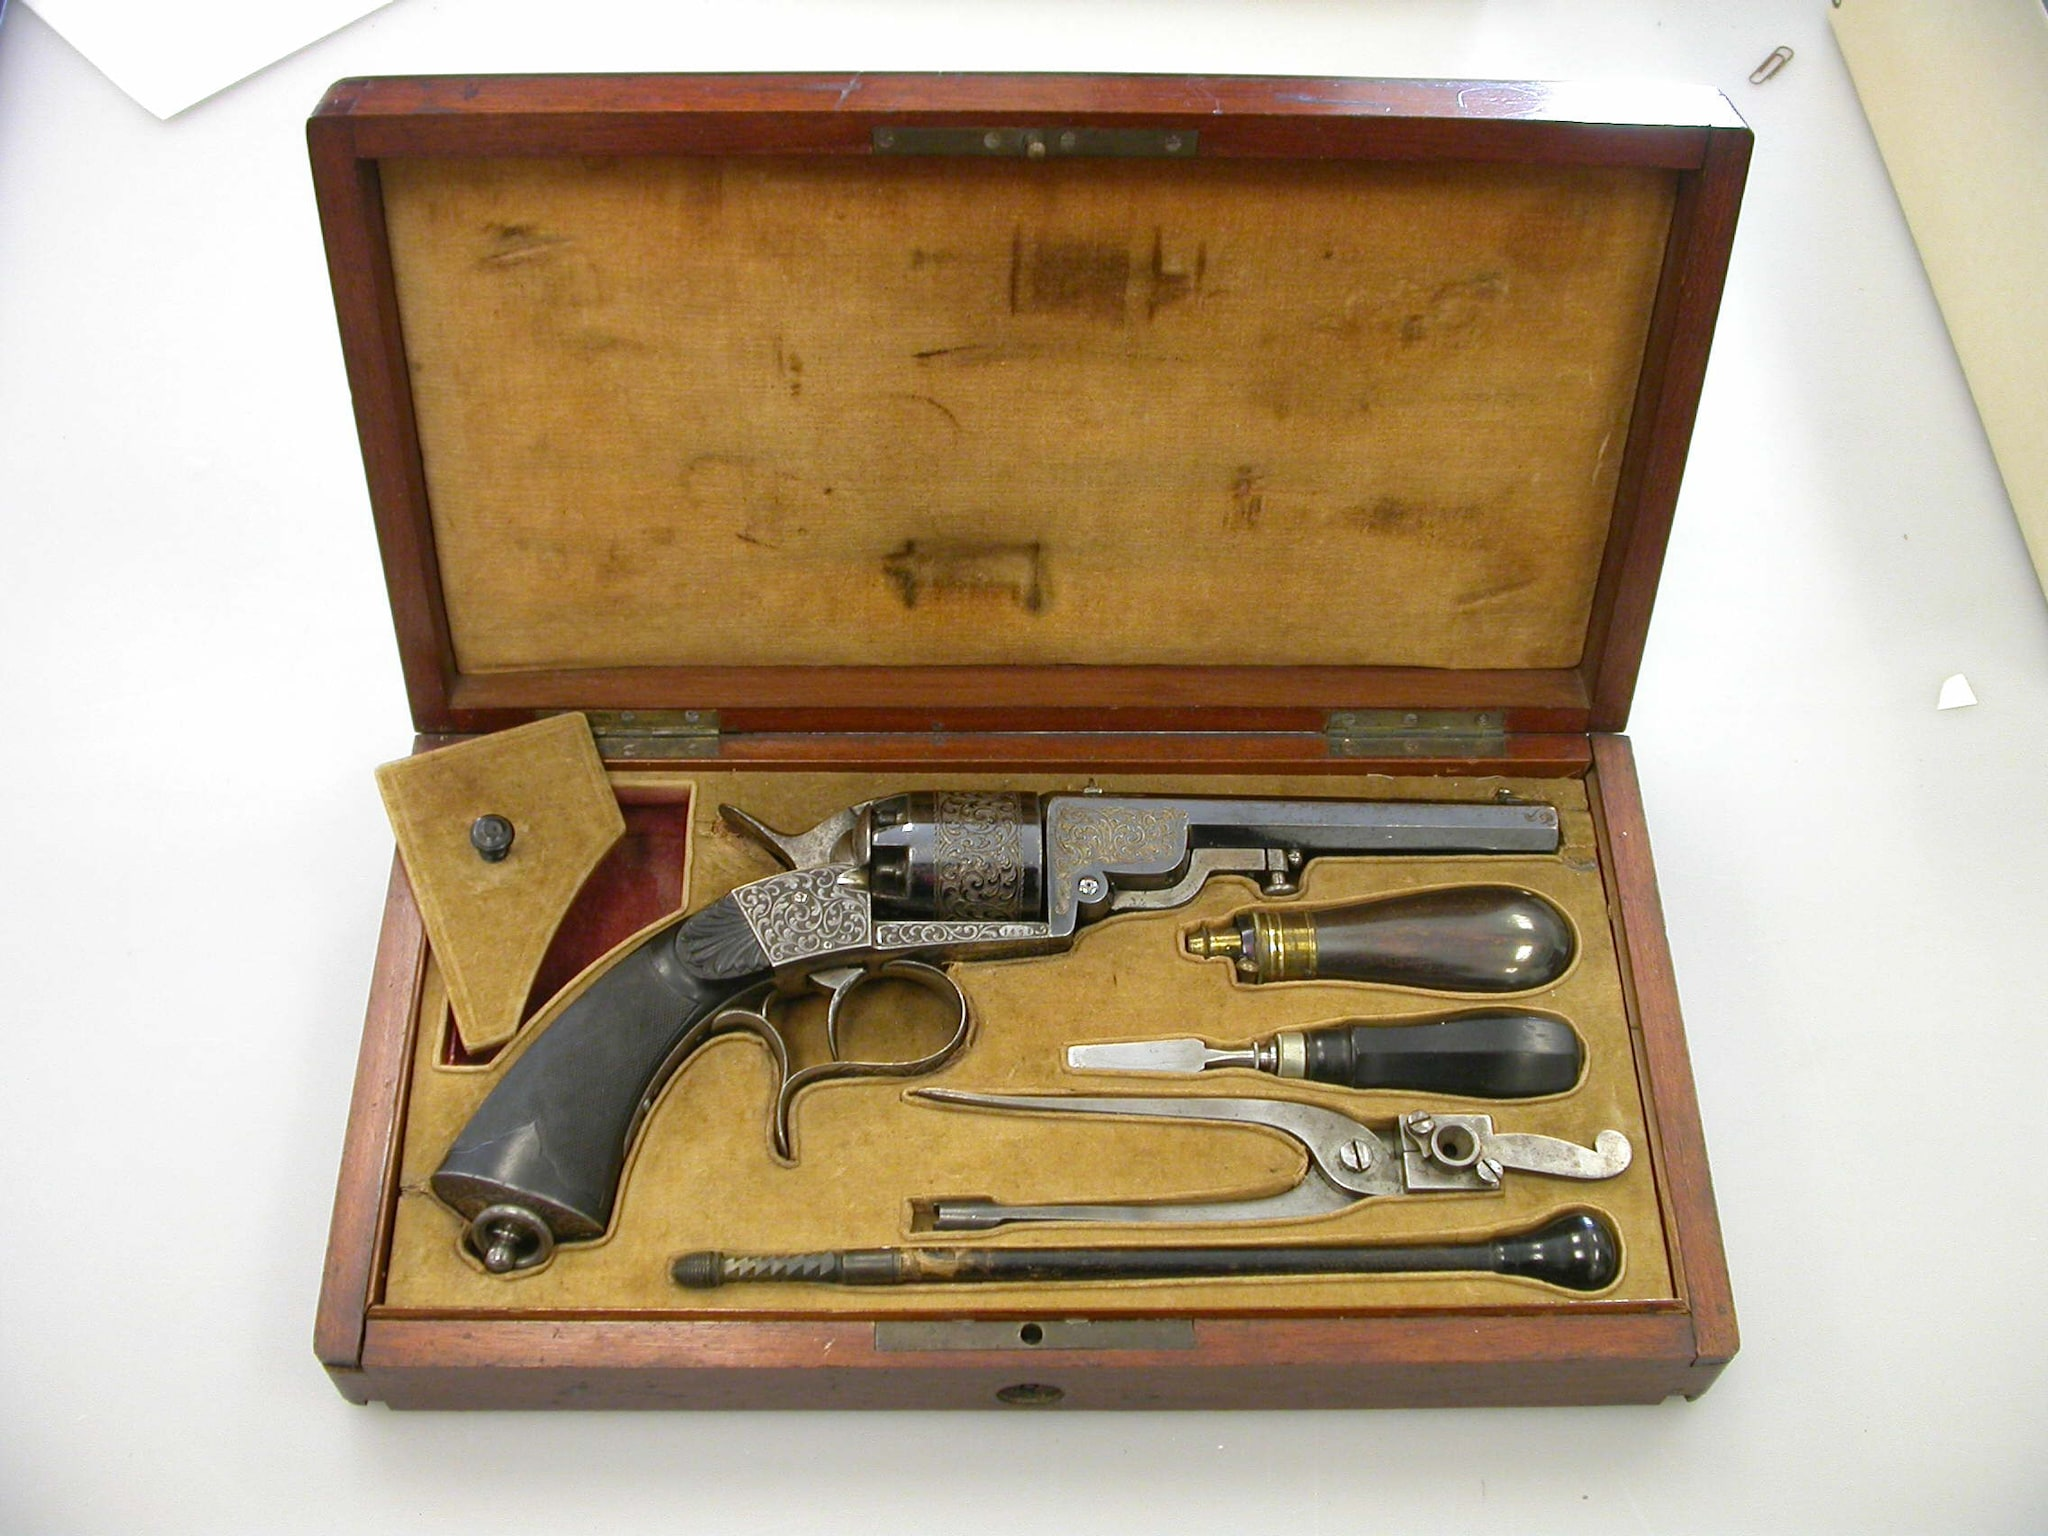 Houllier-Blanchard Navy revolver semmes